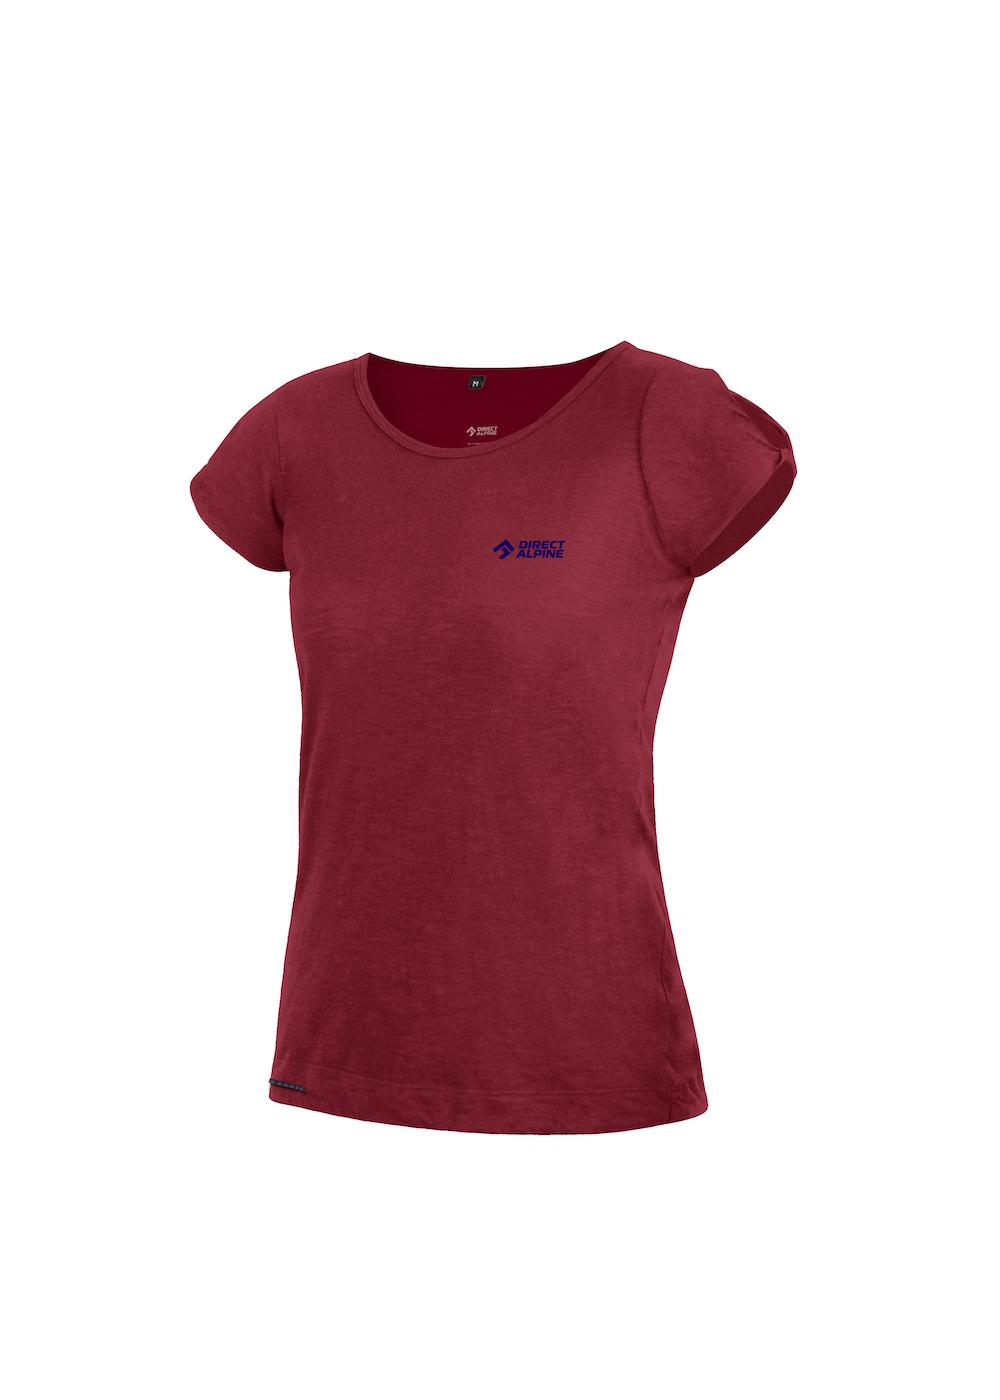 Directalpine - T-Shirt Yoga Lady, T-Shirt